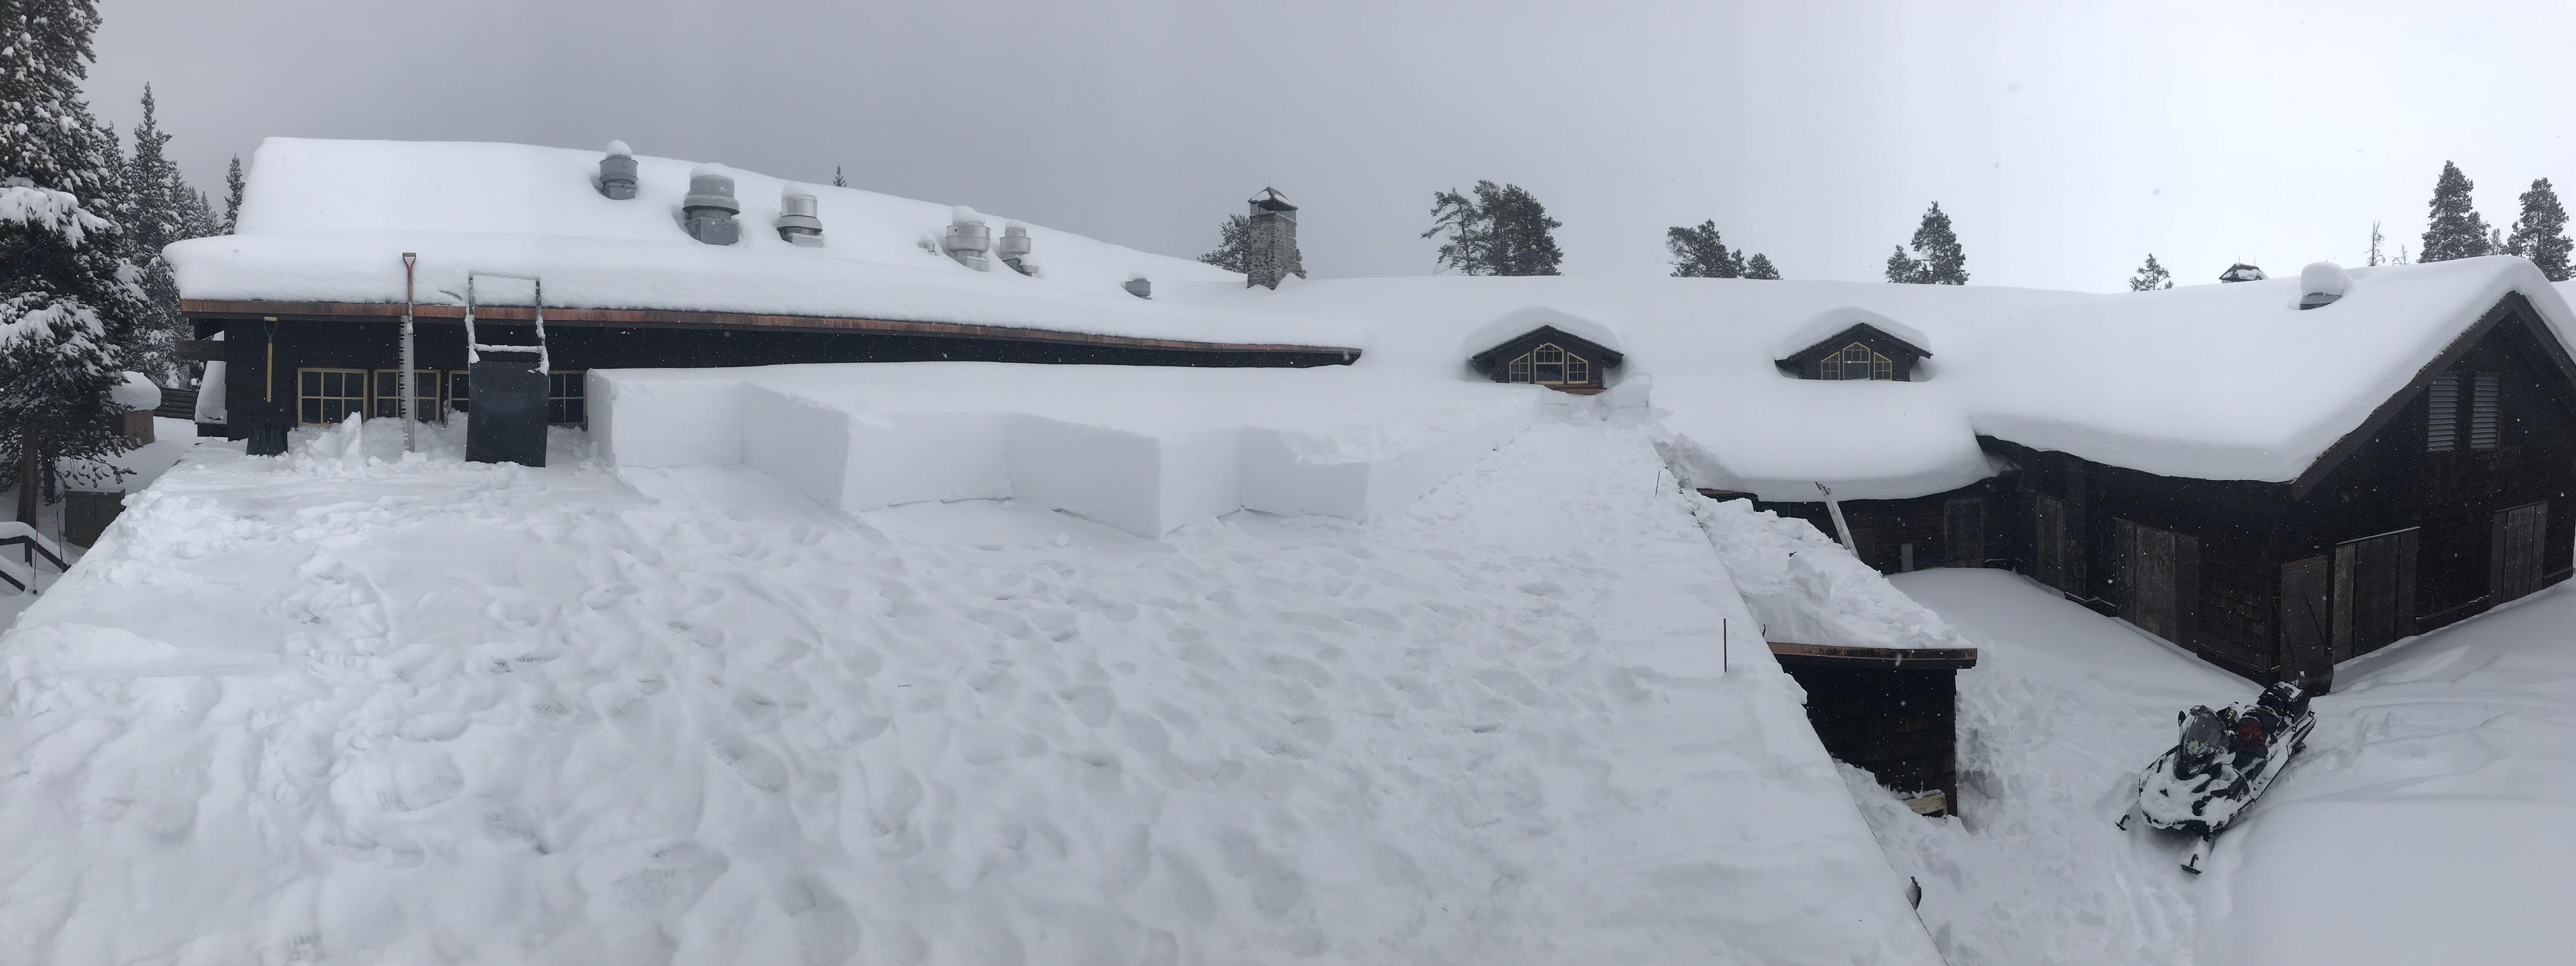 Lake Lodge Snow Removal